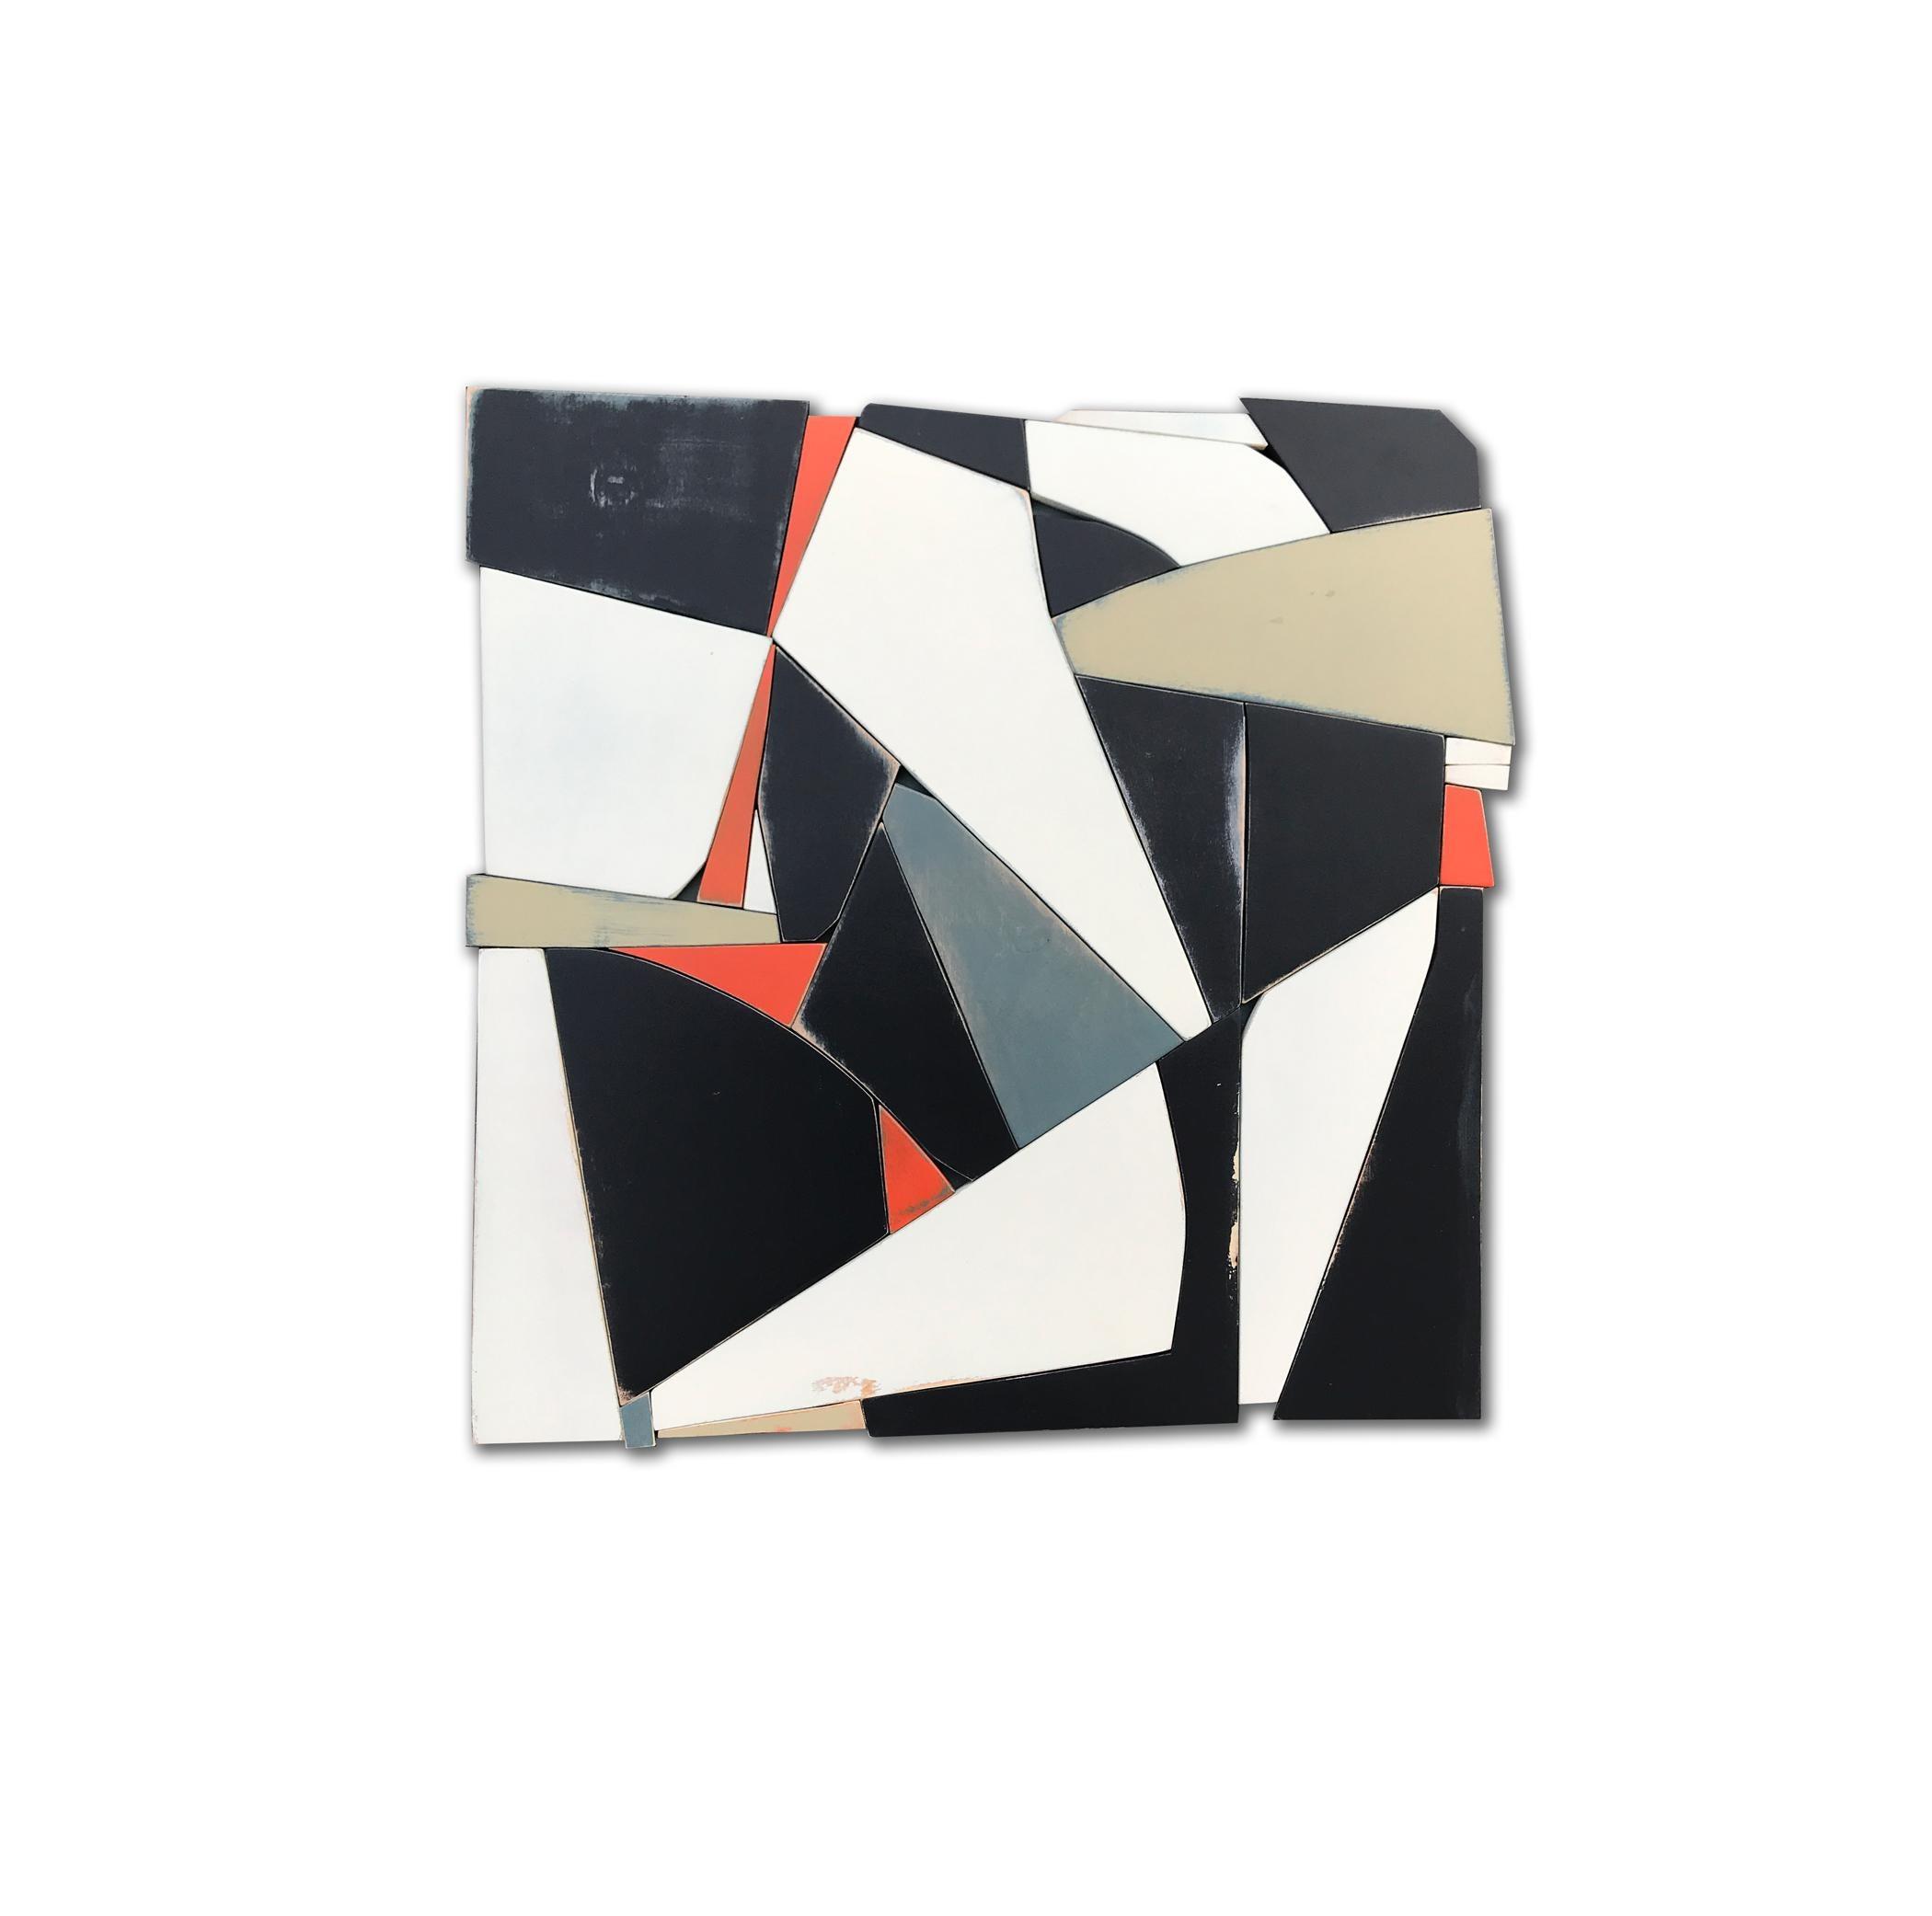 Merchant of Speed (modern abstract wall sculpture black white geometric design)